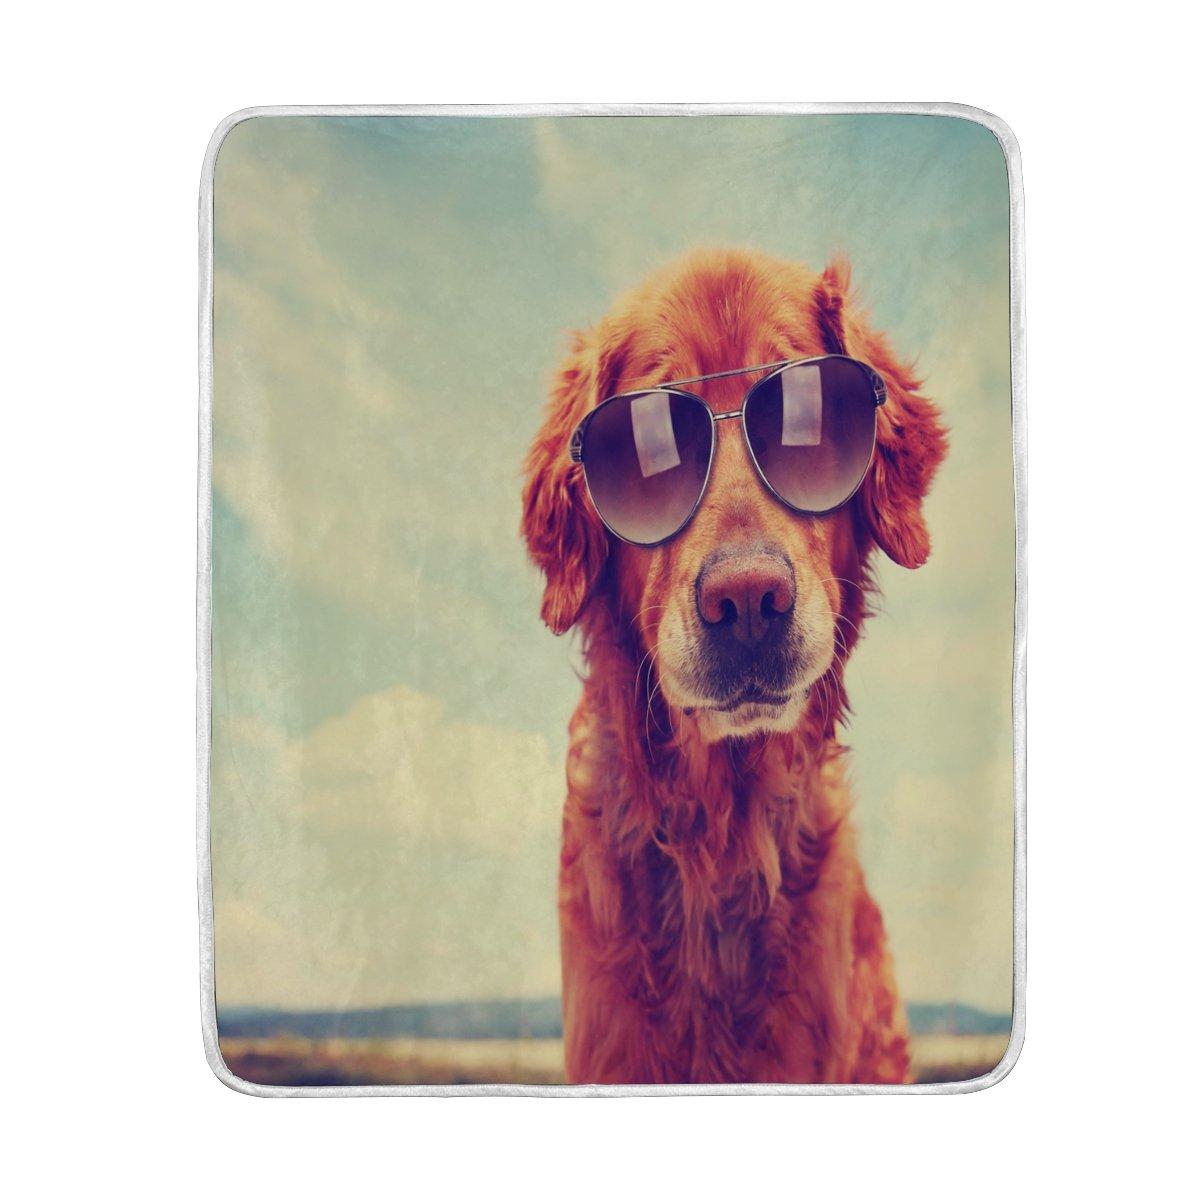 AlazaホームインテリアレトロSkyゴールデンレトリーバー犬ソフト暖かい毛布ベッドソファソファ軽量旅行キャンプ60 x 50インチThrowサイズfor Kids Boys Girls B076D7RXTY